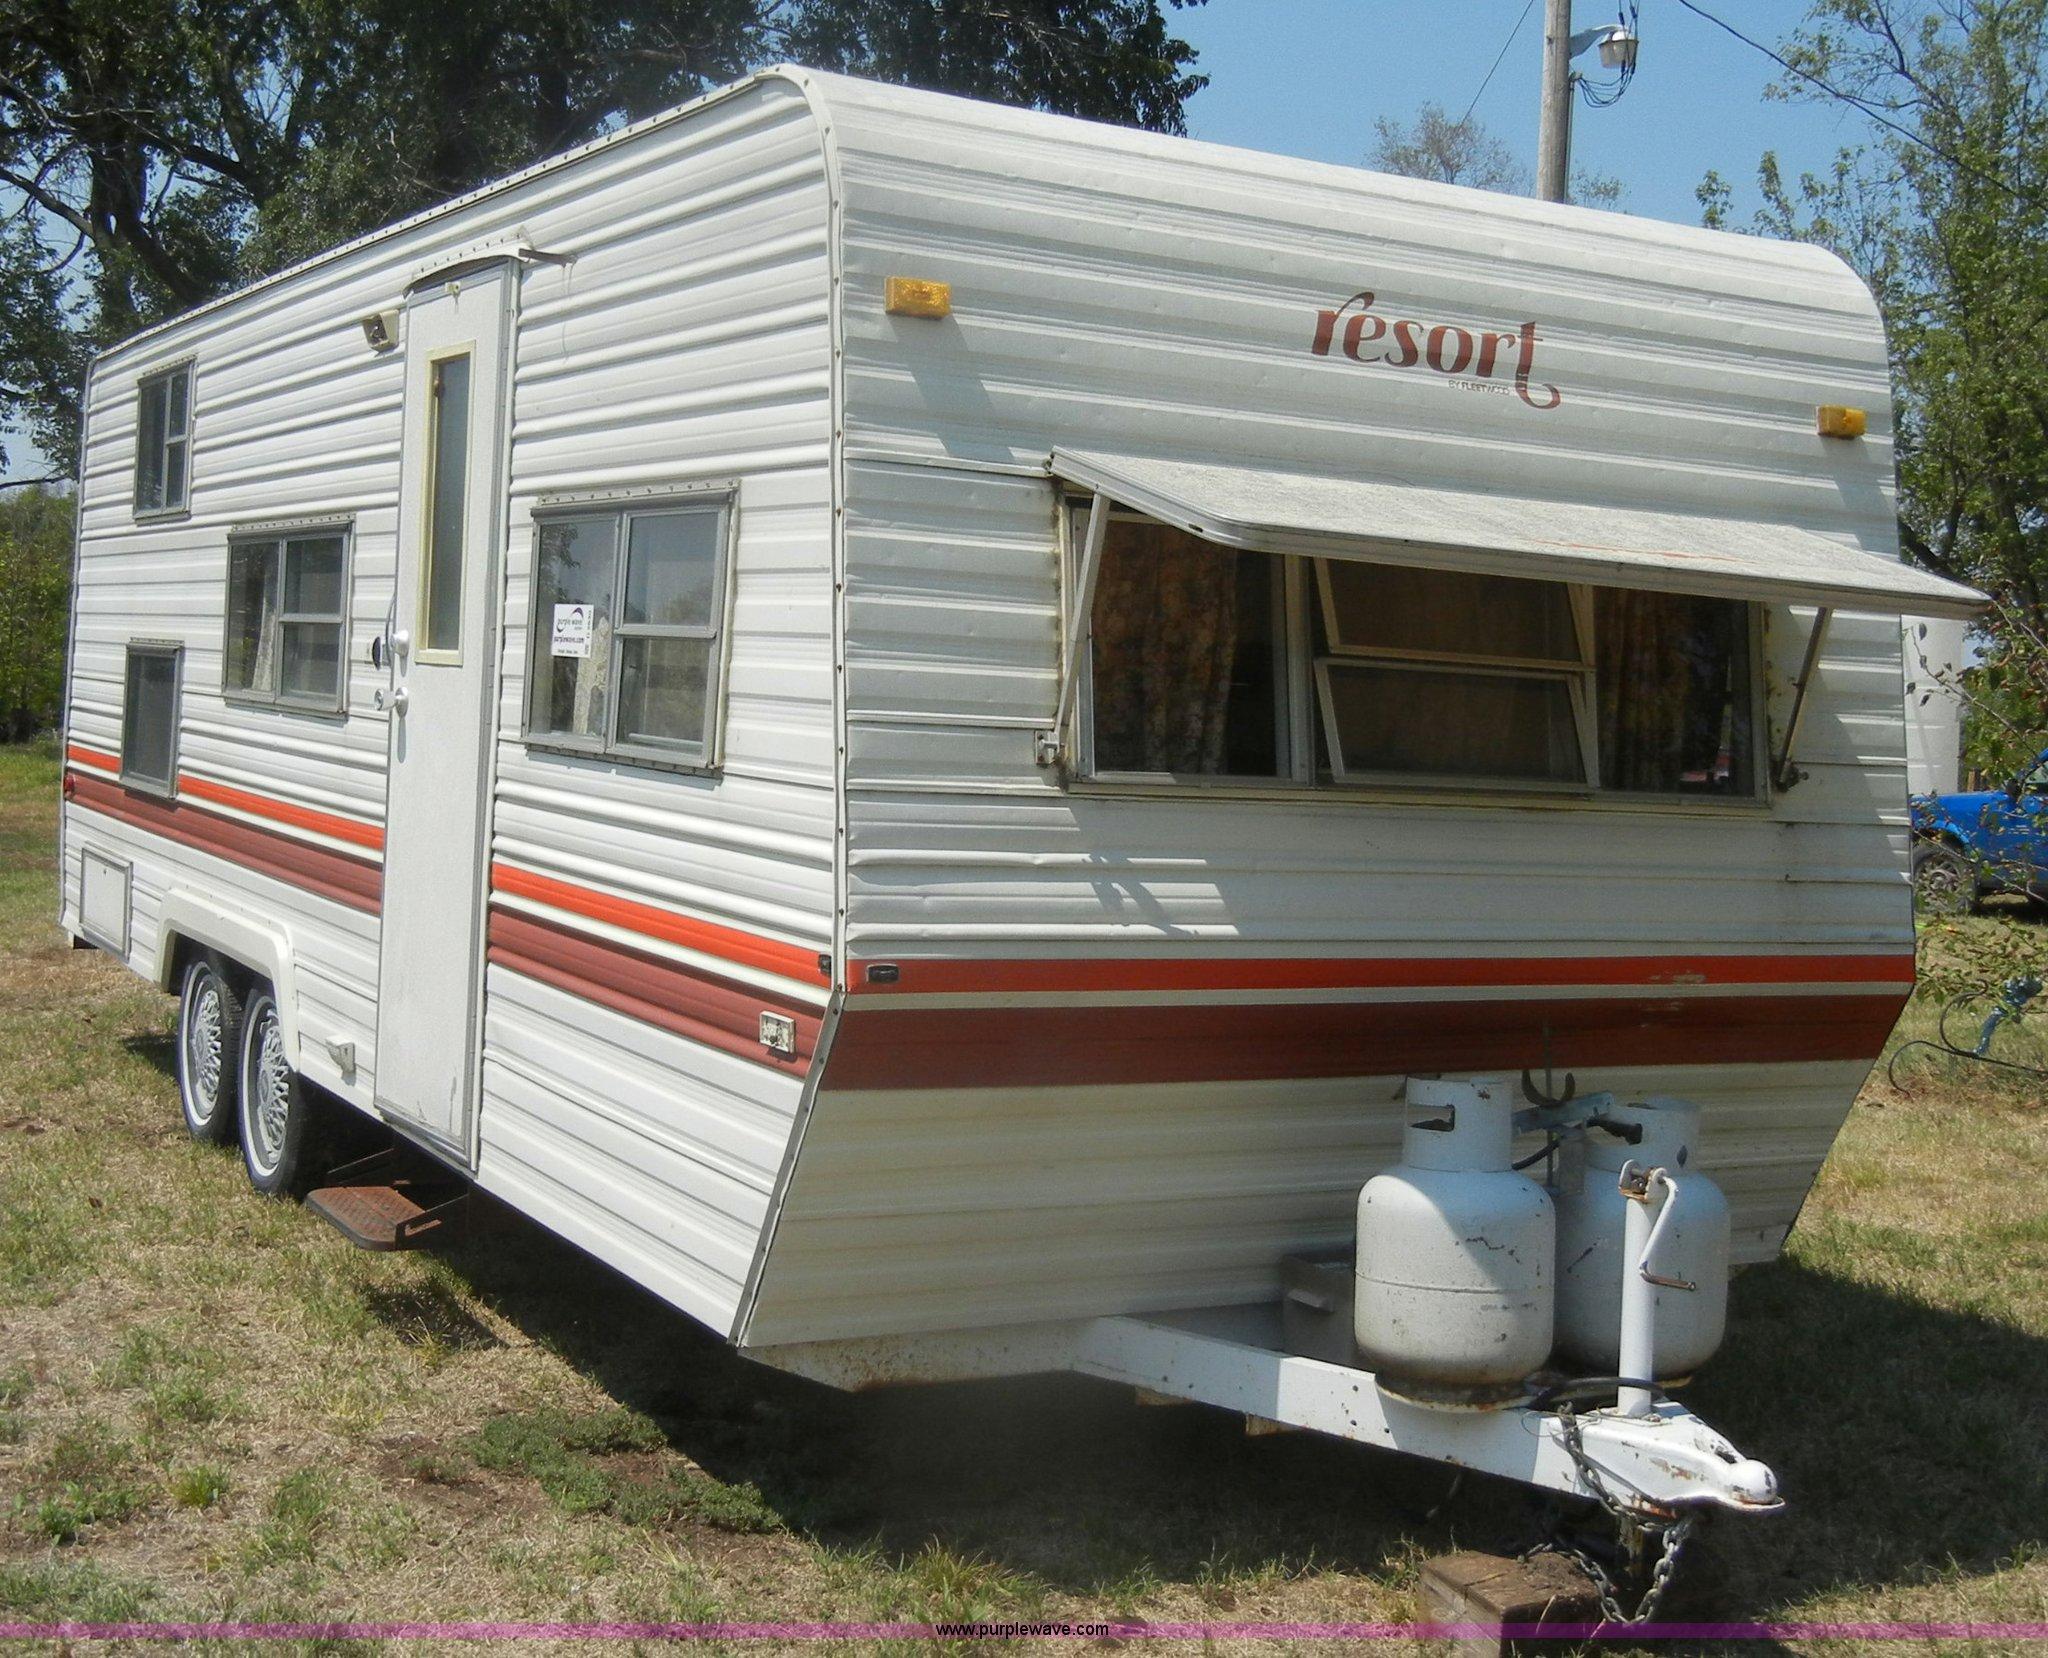 1984 Fleetwood Resort 21' camper | Item D5630 | SOLD! Septem